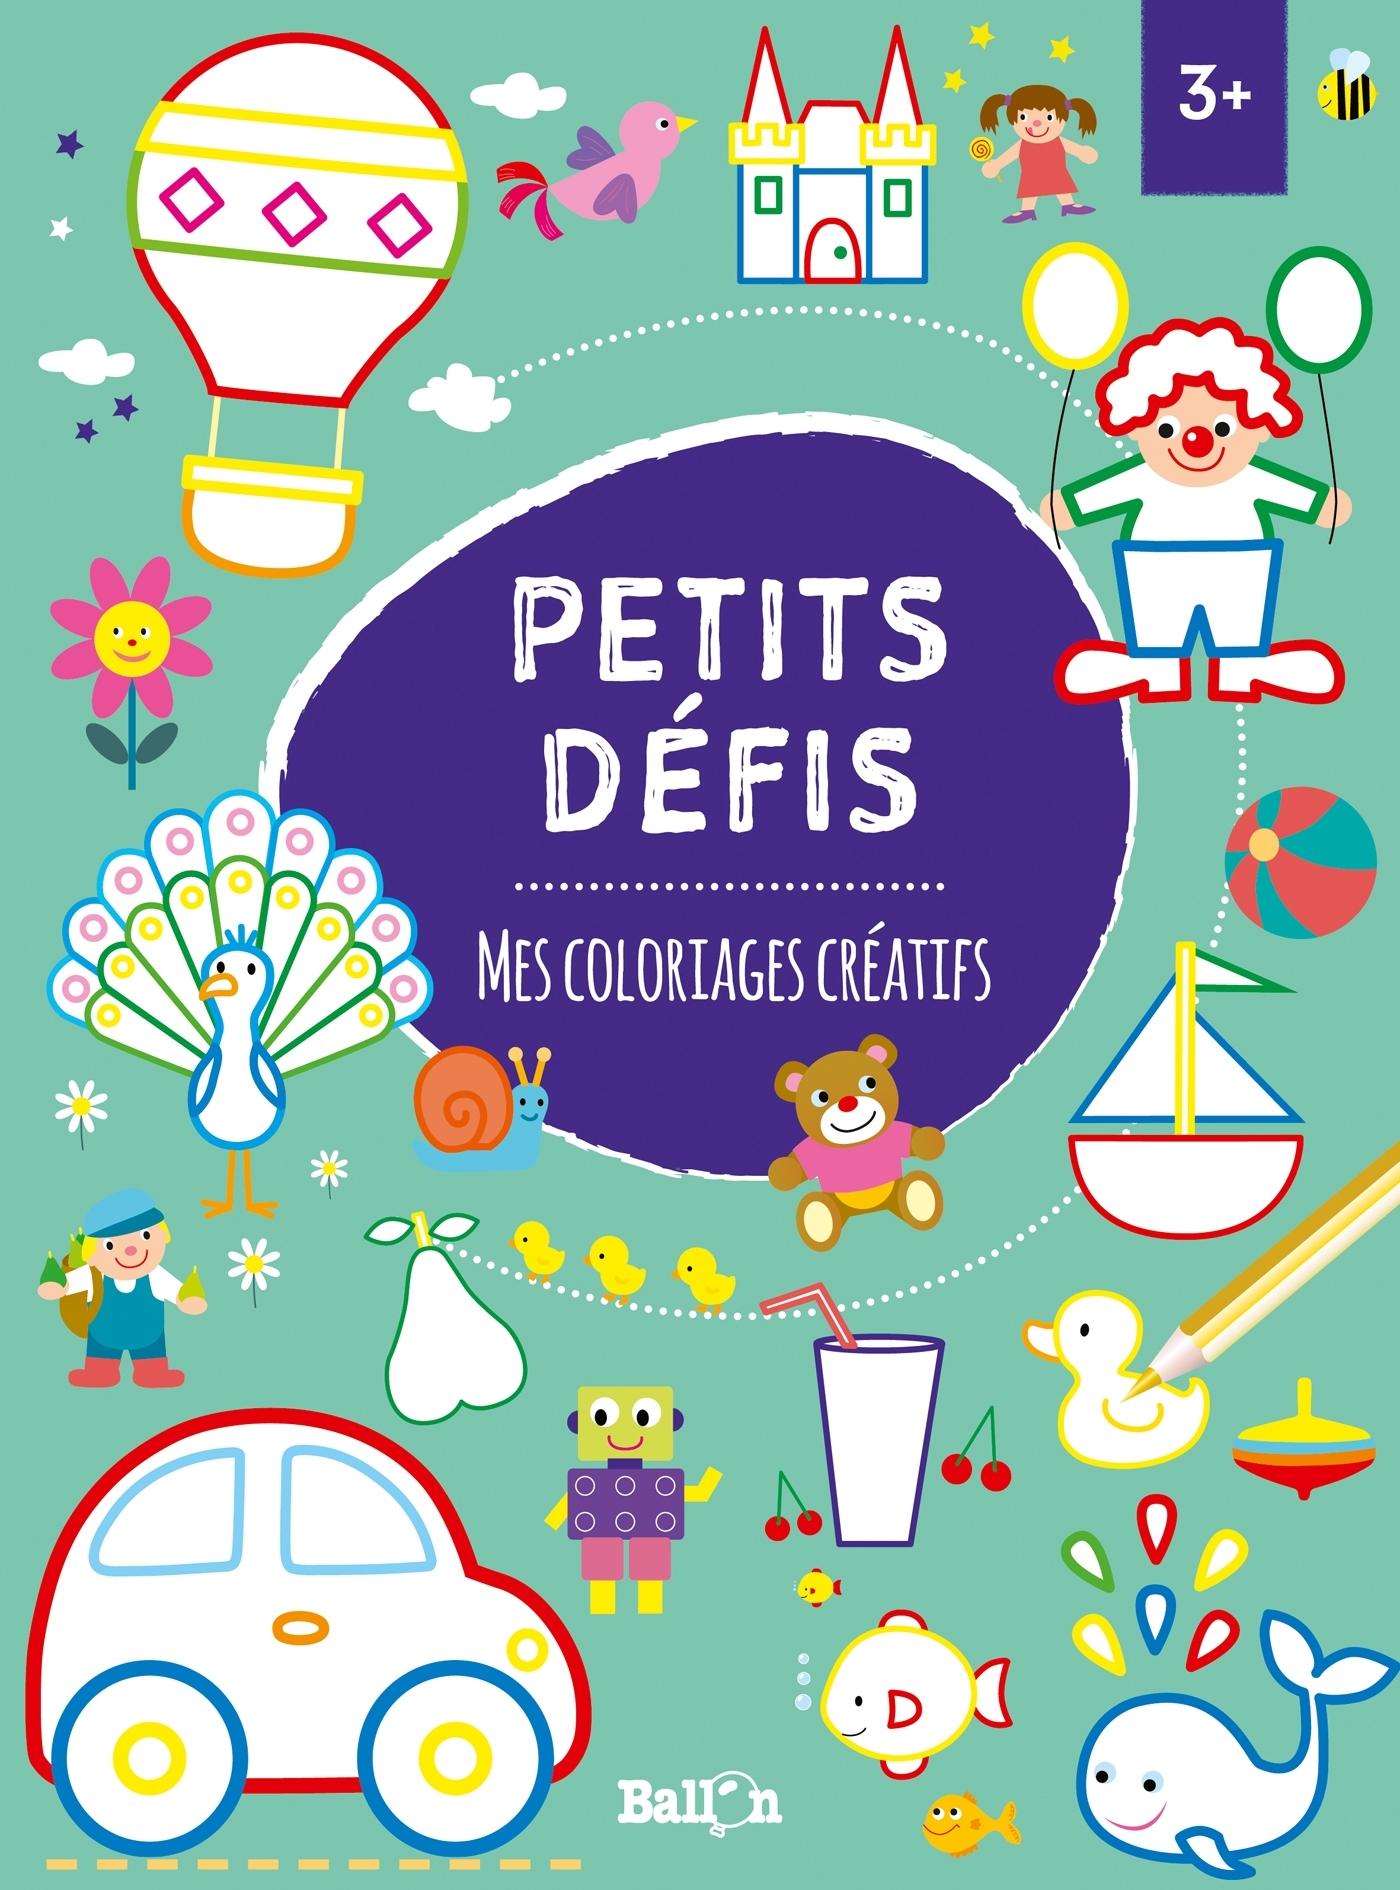 PETITS DEFIS : MES COLORIAGES CREATIFS